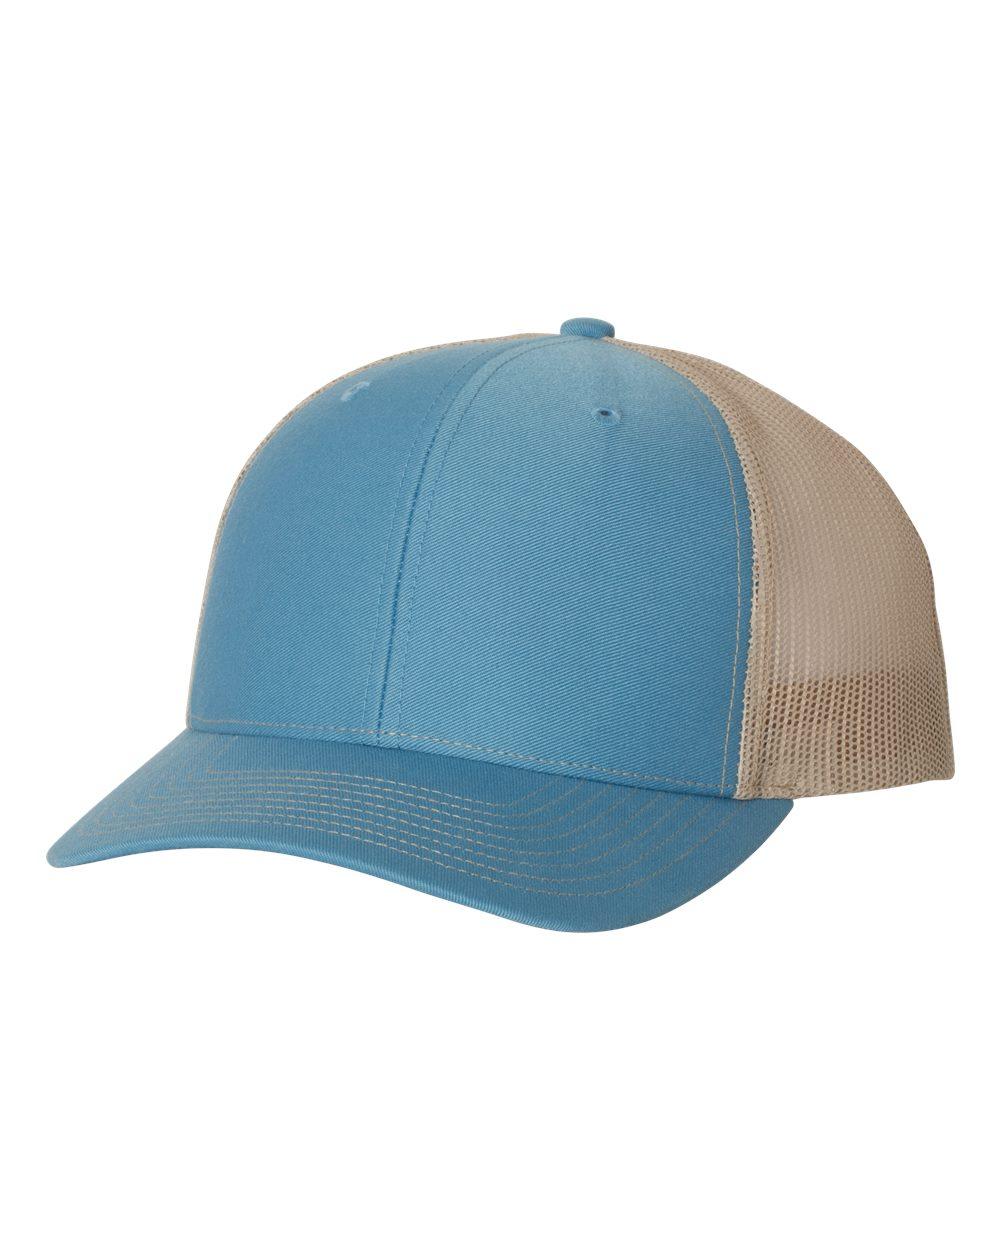 click to view Columbia Blue/ Khaki